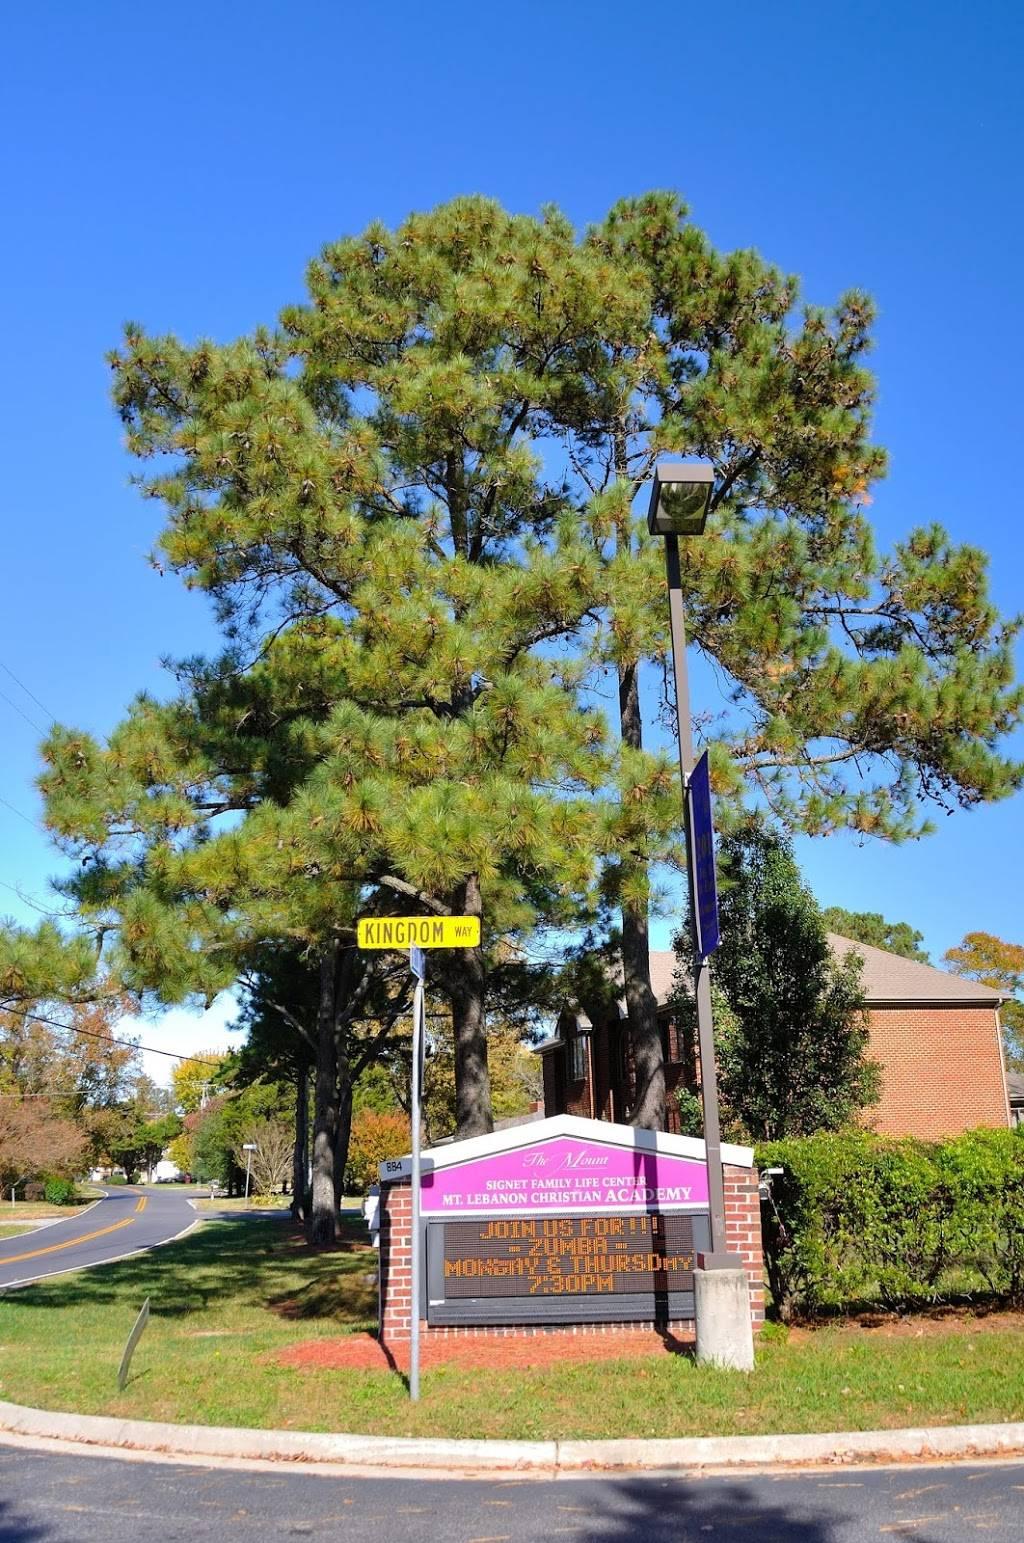 Mount Lebanon Baptist Church - church  | Photo 3 of 8 | Address: 884 Bells Mill Rd, Chesapeake, VA 23322, USA | Phone: (757) 547-3388